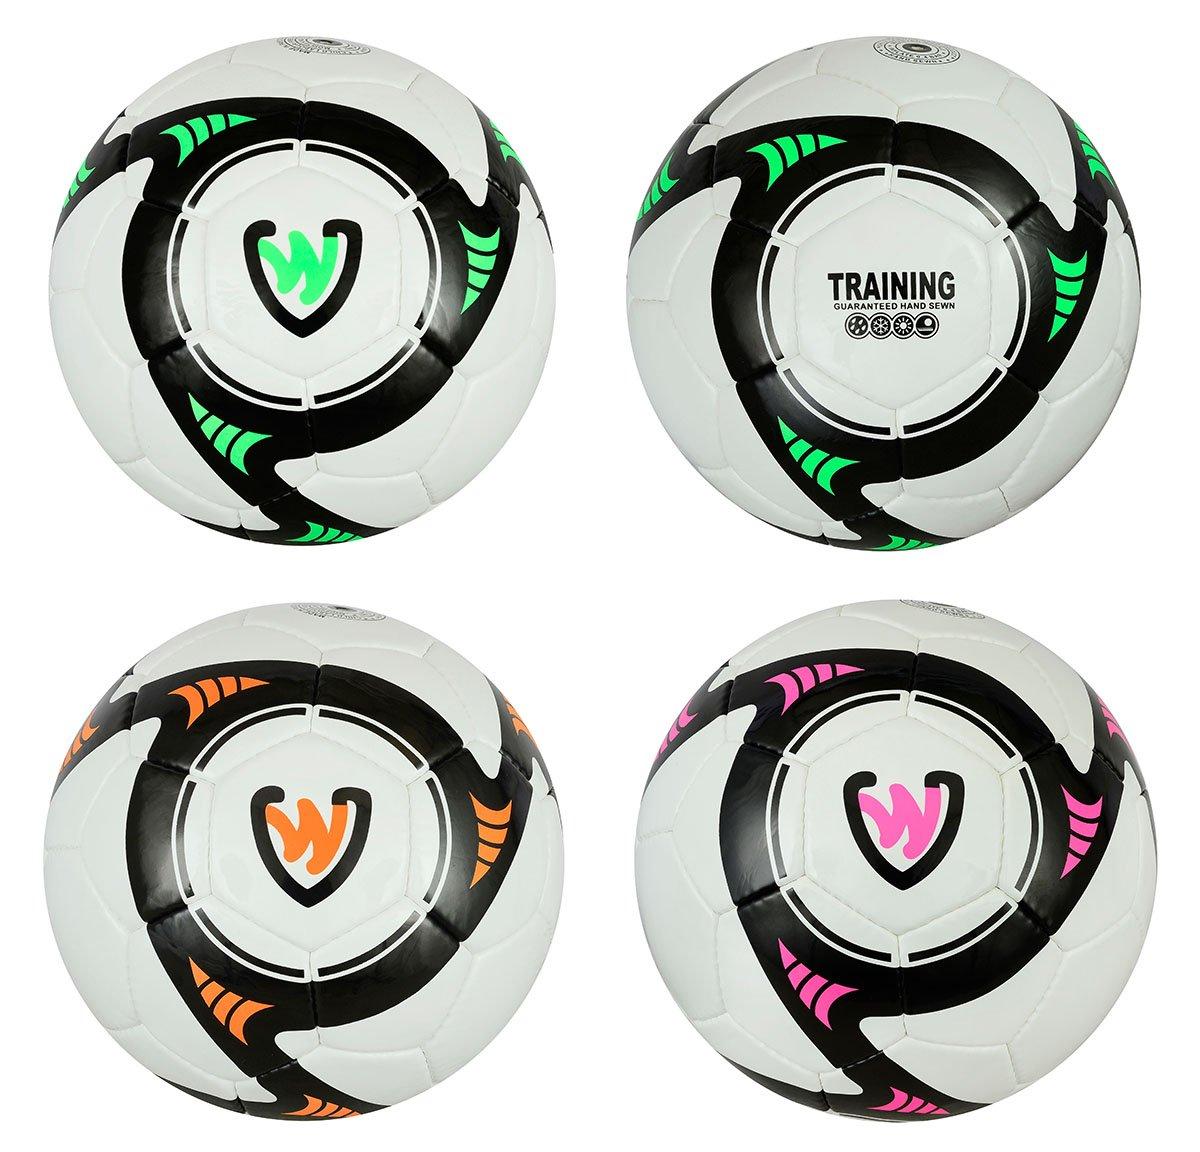 germanwear deft Fútbol Tamaño 5PU/PVC 1.3mm Balón de entrenamiento, unisex, naranja German Wear